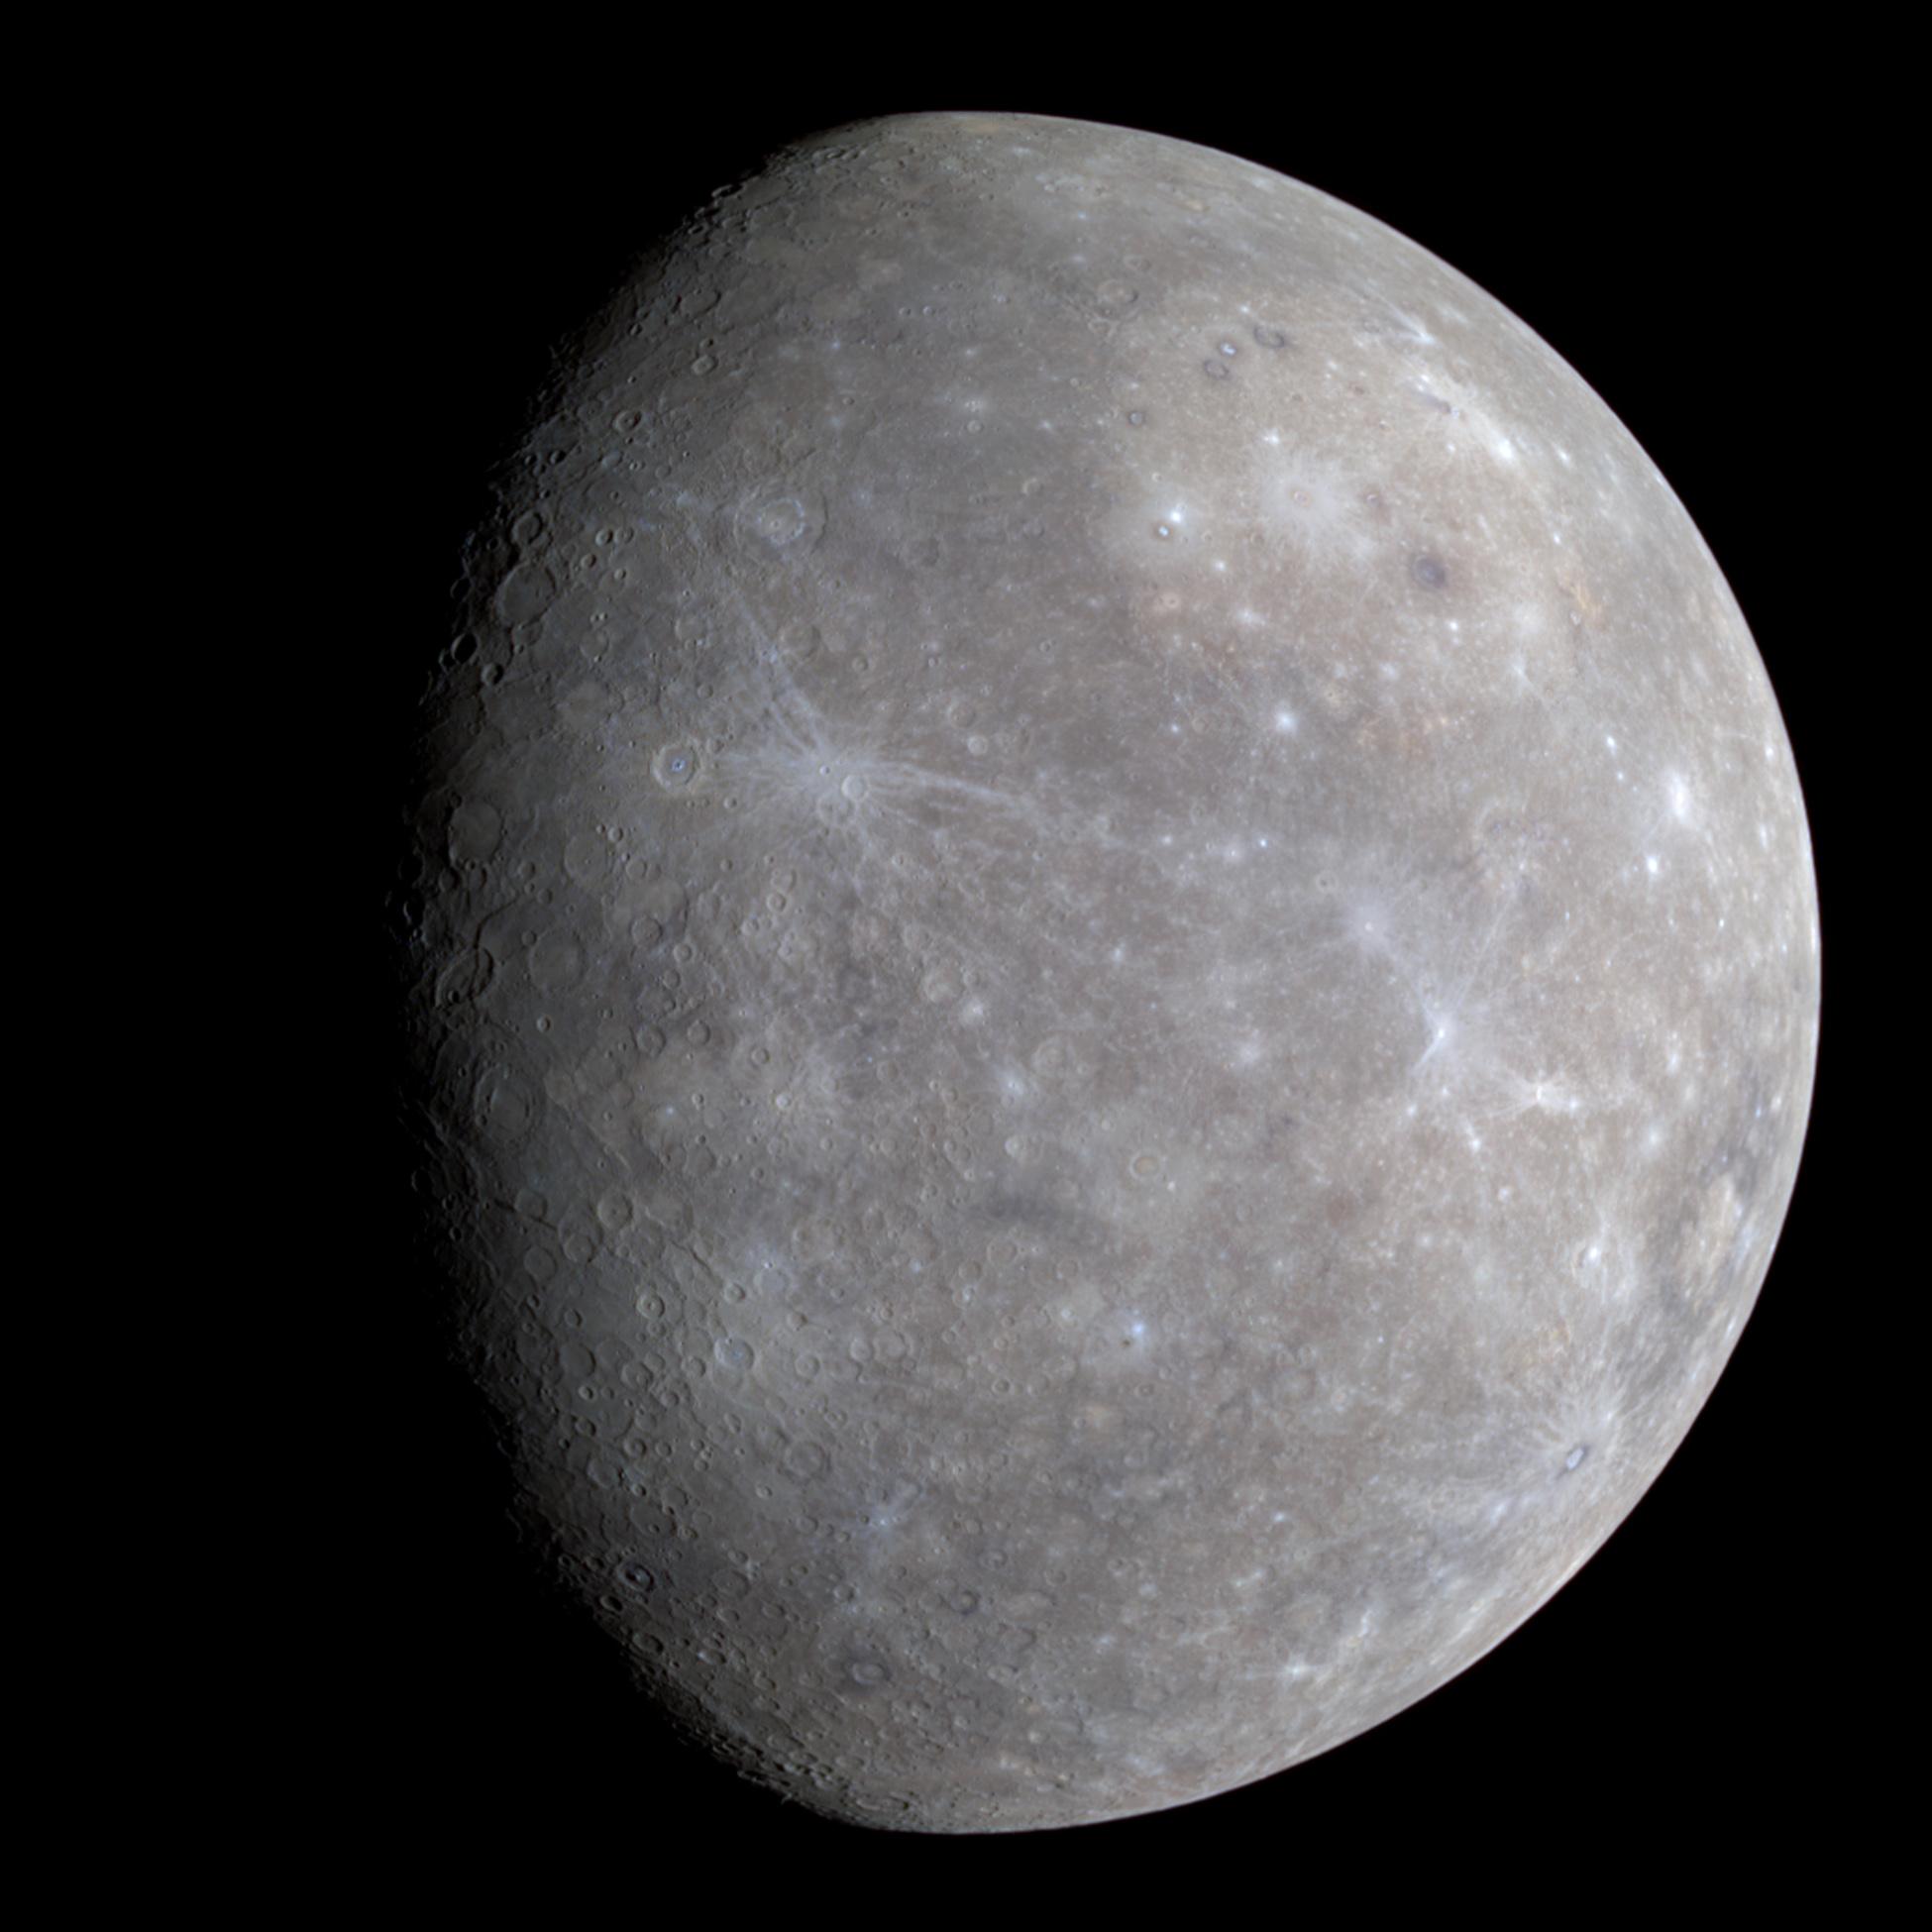 Images of Mercury | 1950x1950